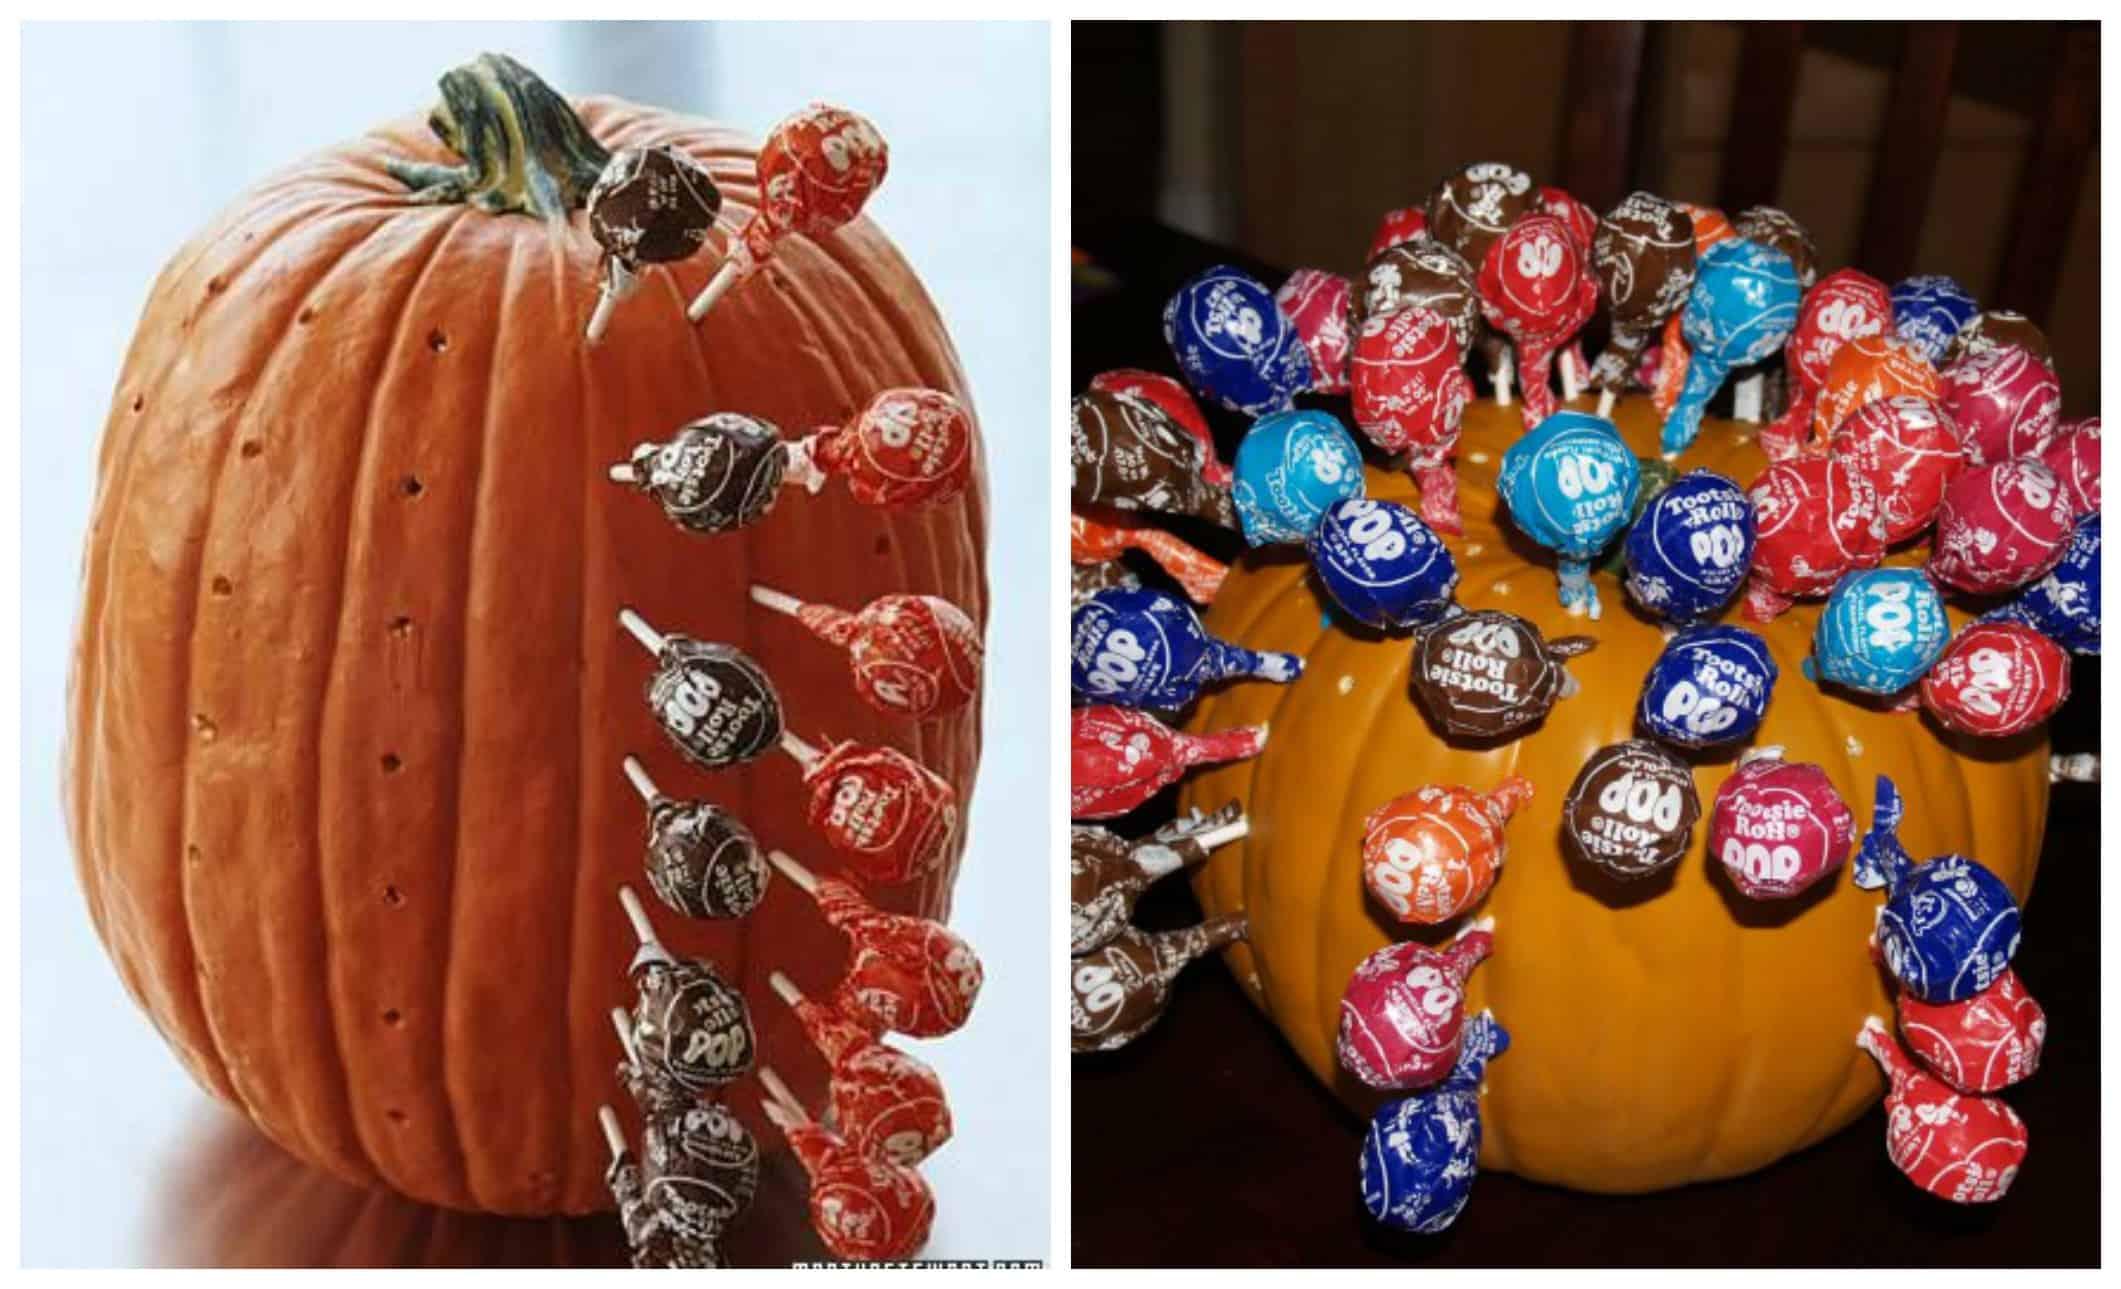 Zucca per un halloween fai da te per bambini